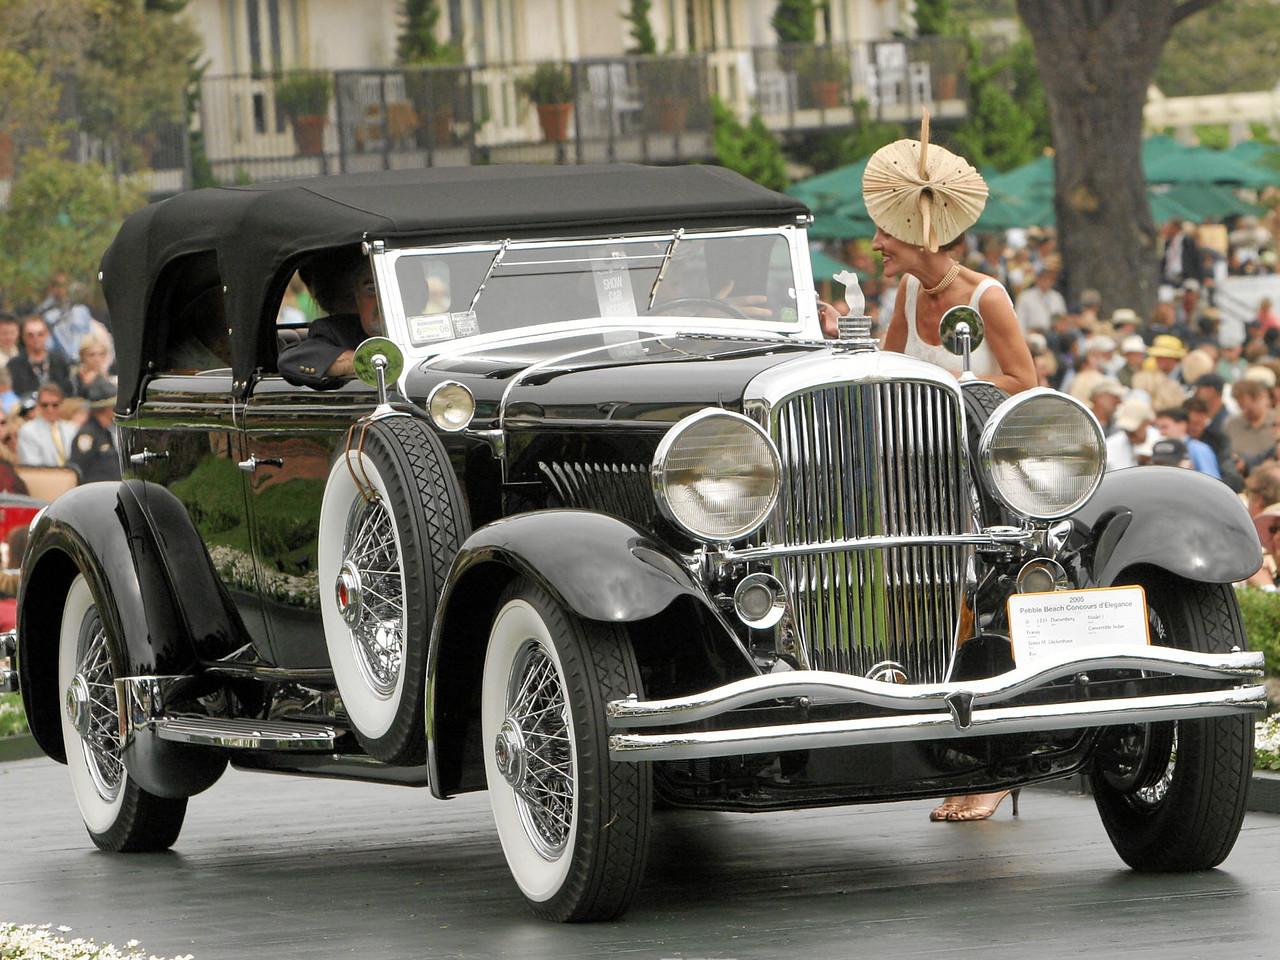 1931 Duesenberg Model J Franay Convertible Sedan owned by James M. Glickenhaus from Rye, New York 2nd Class G (Duesenberg)